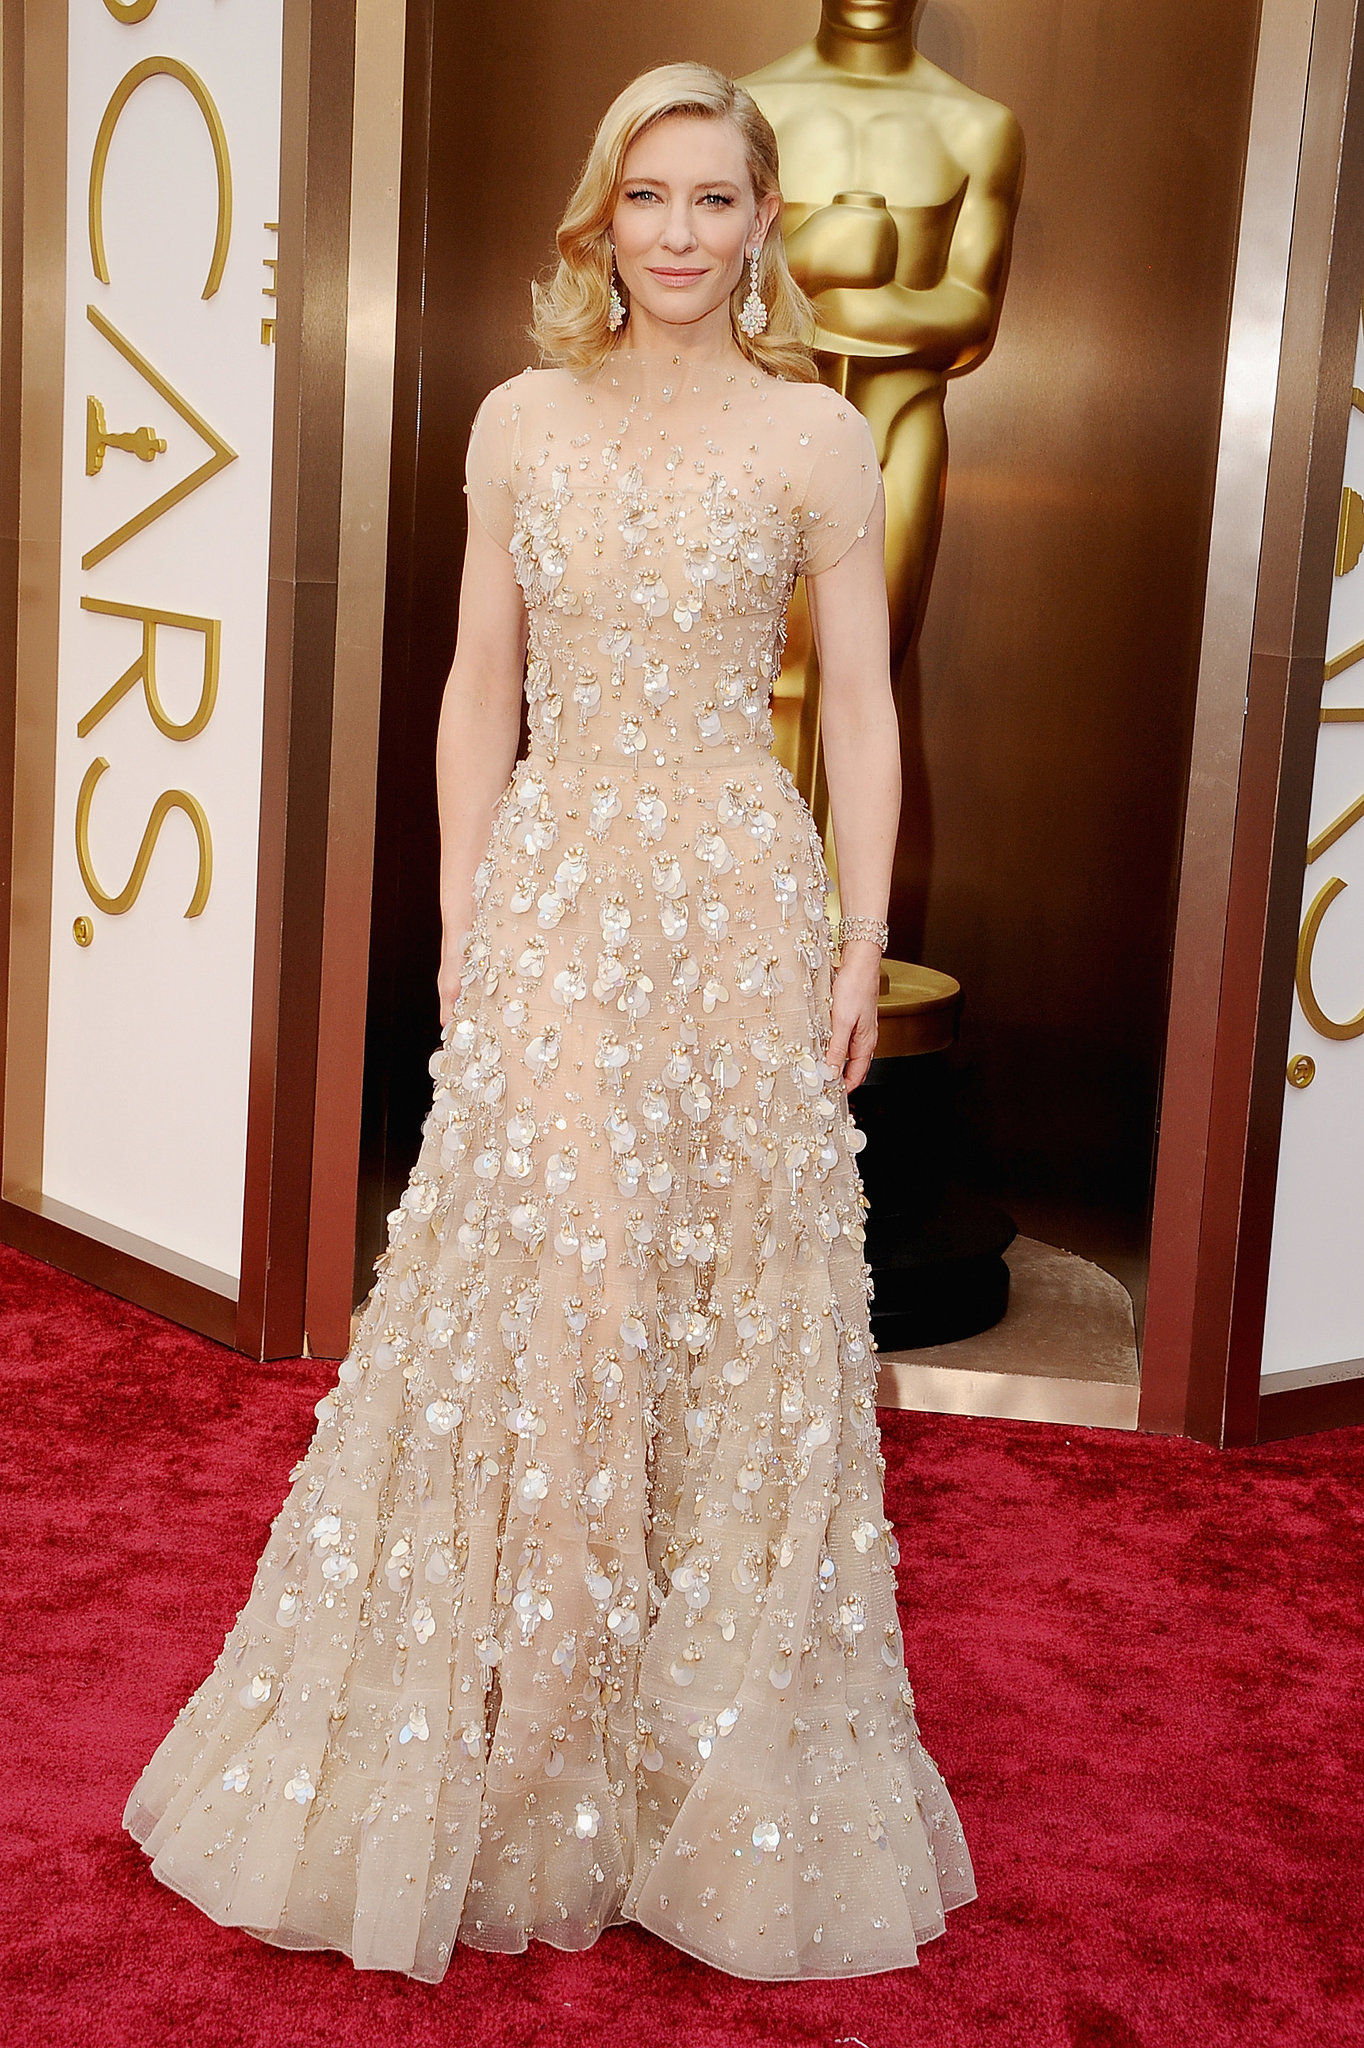 Oscars 2014: Pwetty dresses!